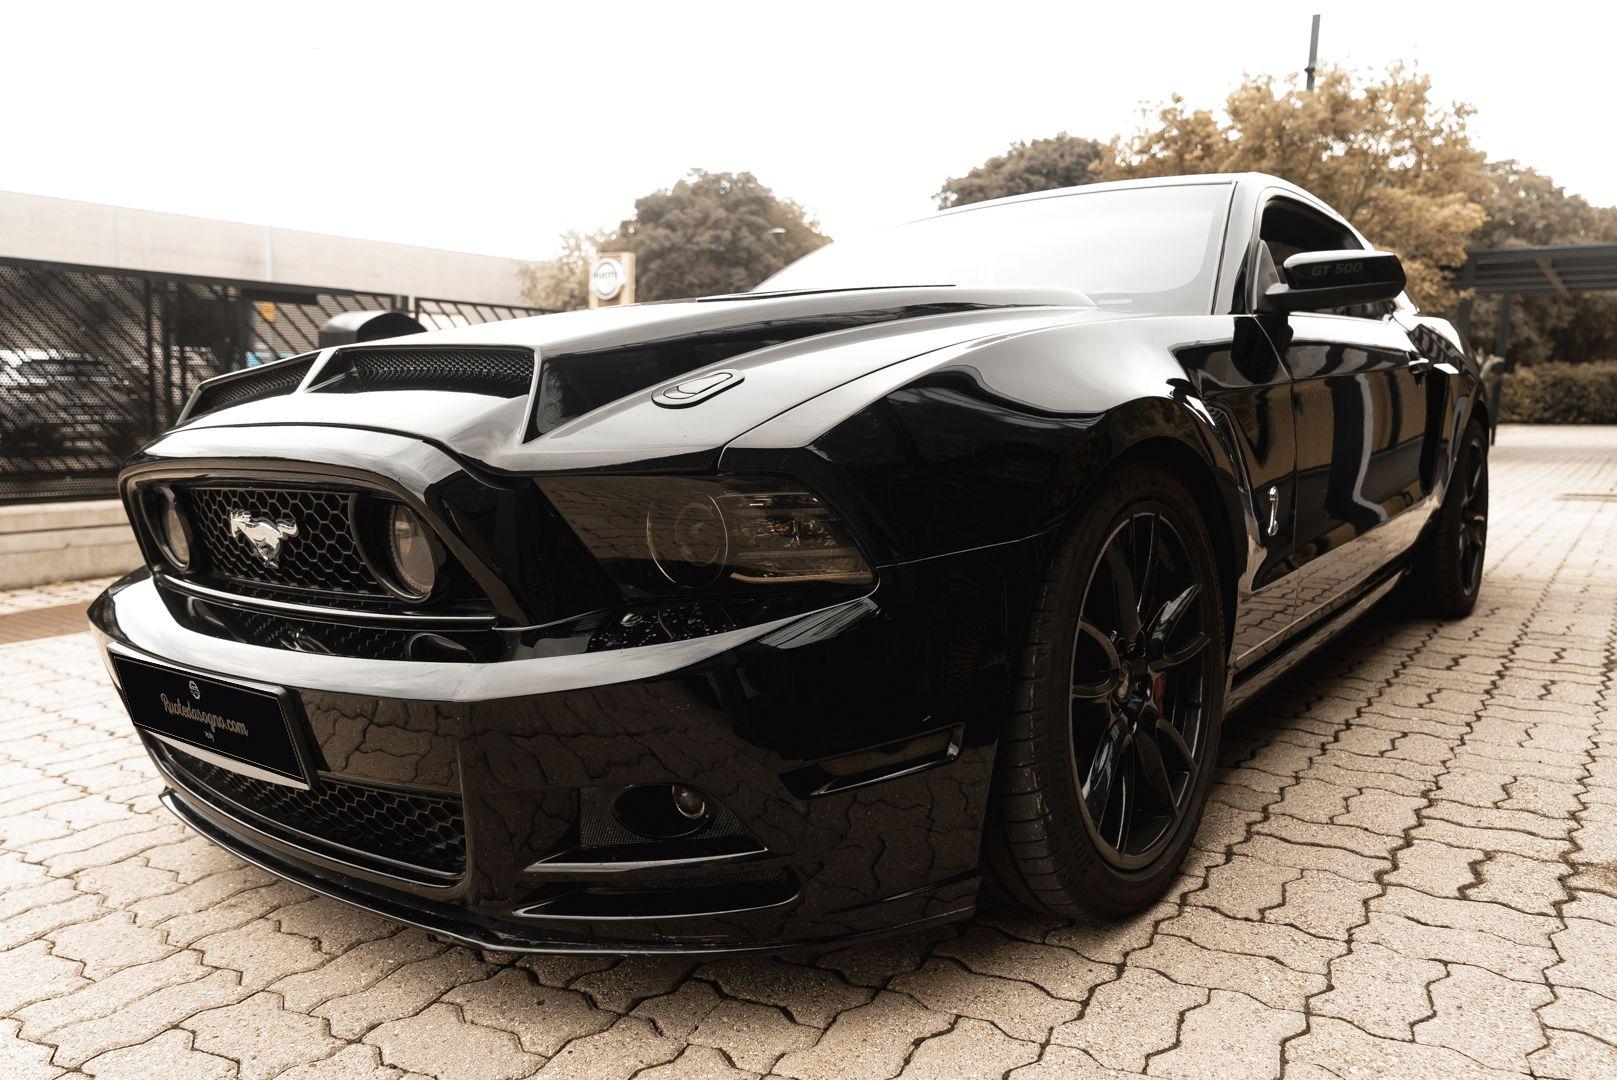 2012 Ford Mustang 5.0 V8 82057